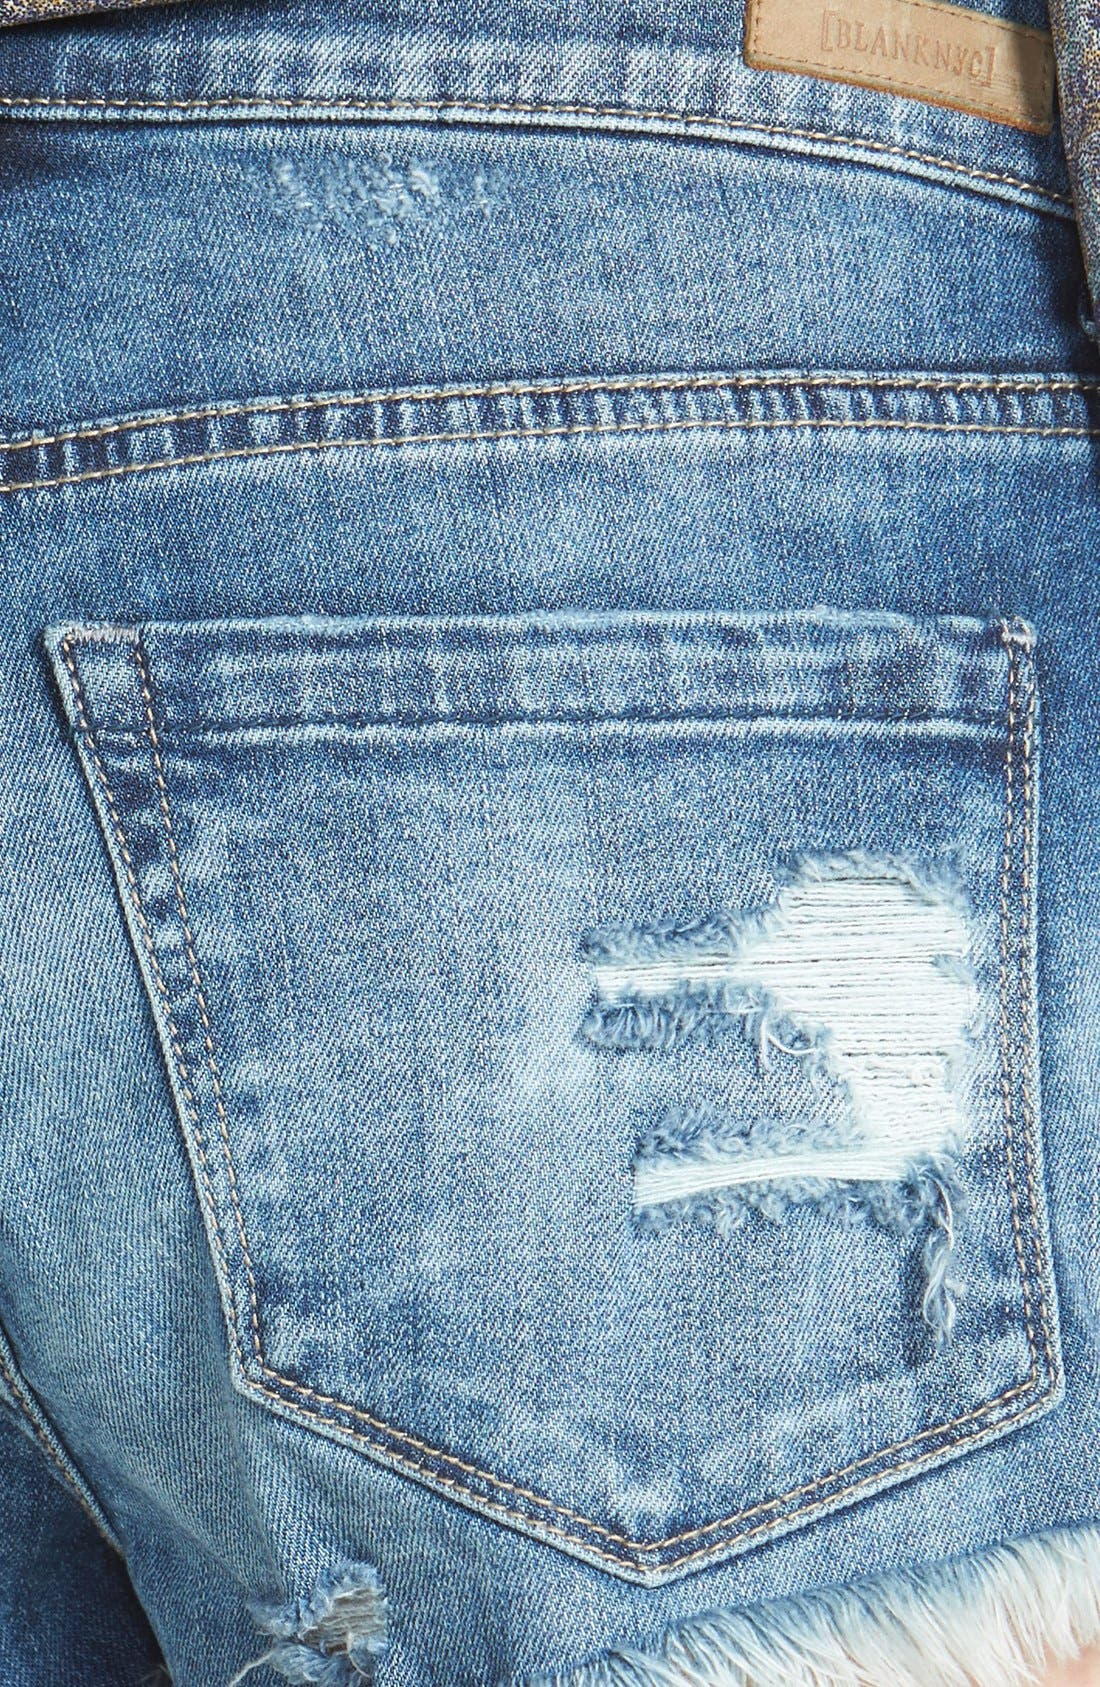 BLANKNYC, 'Fit of Rage' Cutoff Denim Shorts, Alternate thumbnail 2, color, 420